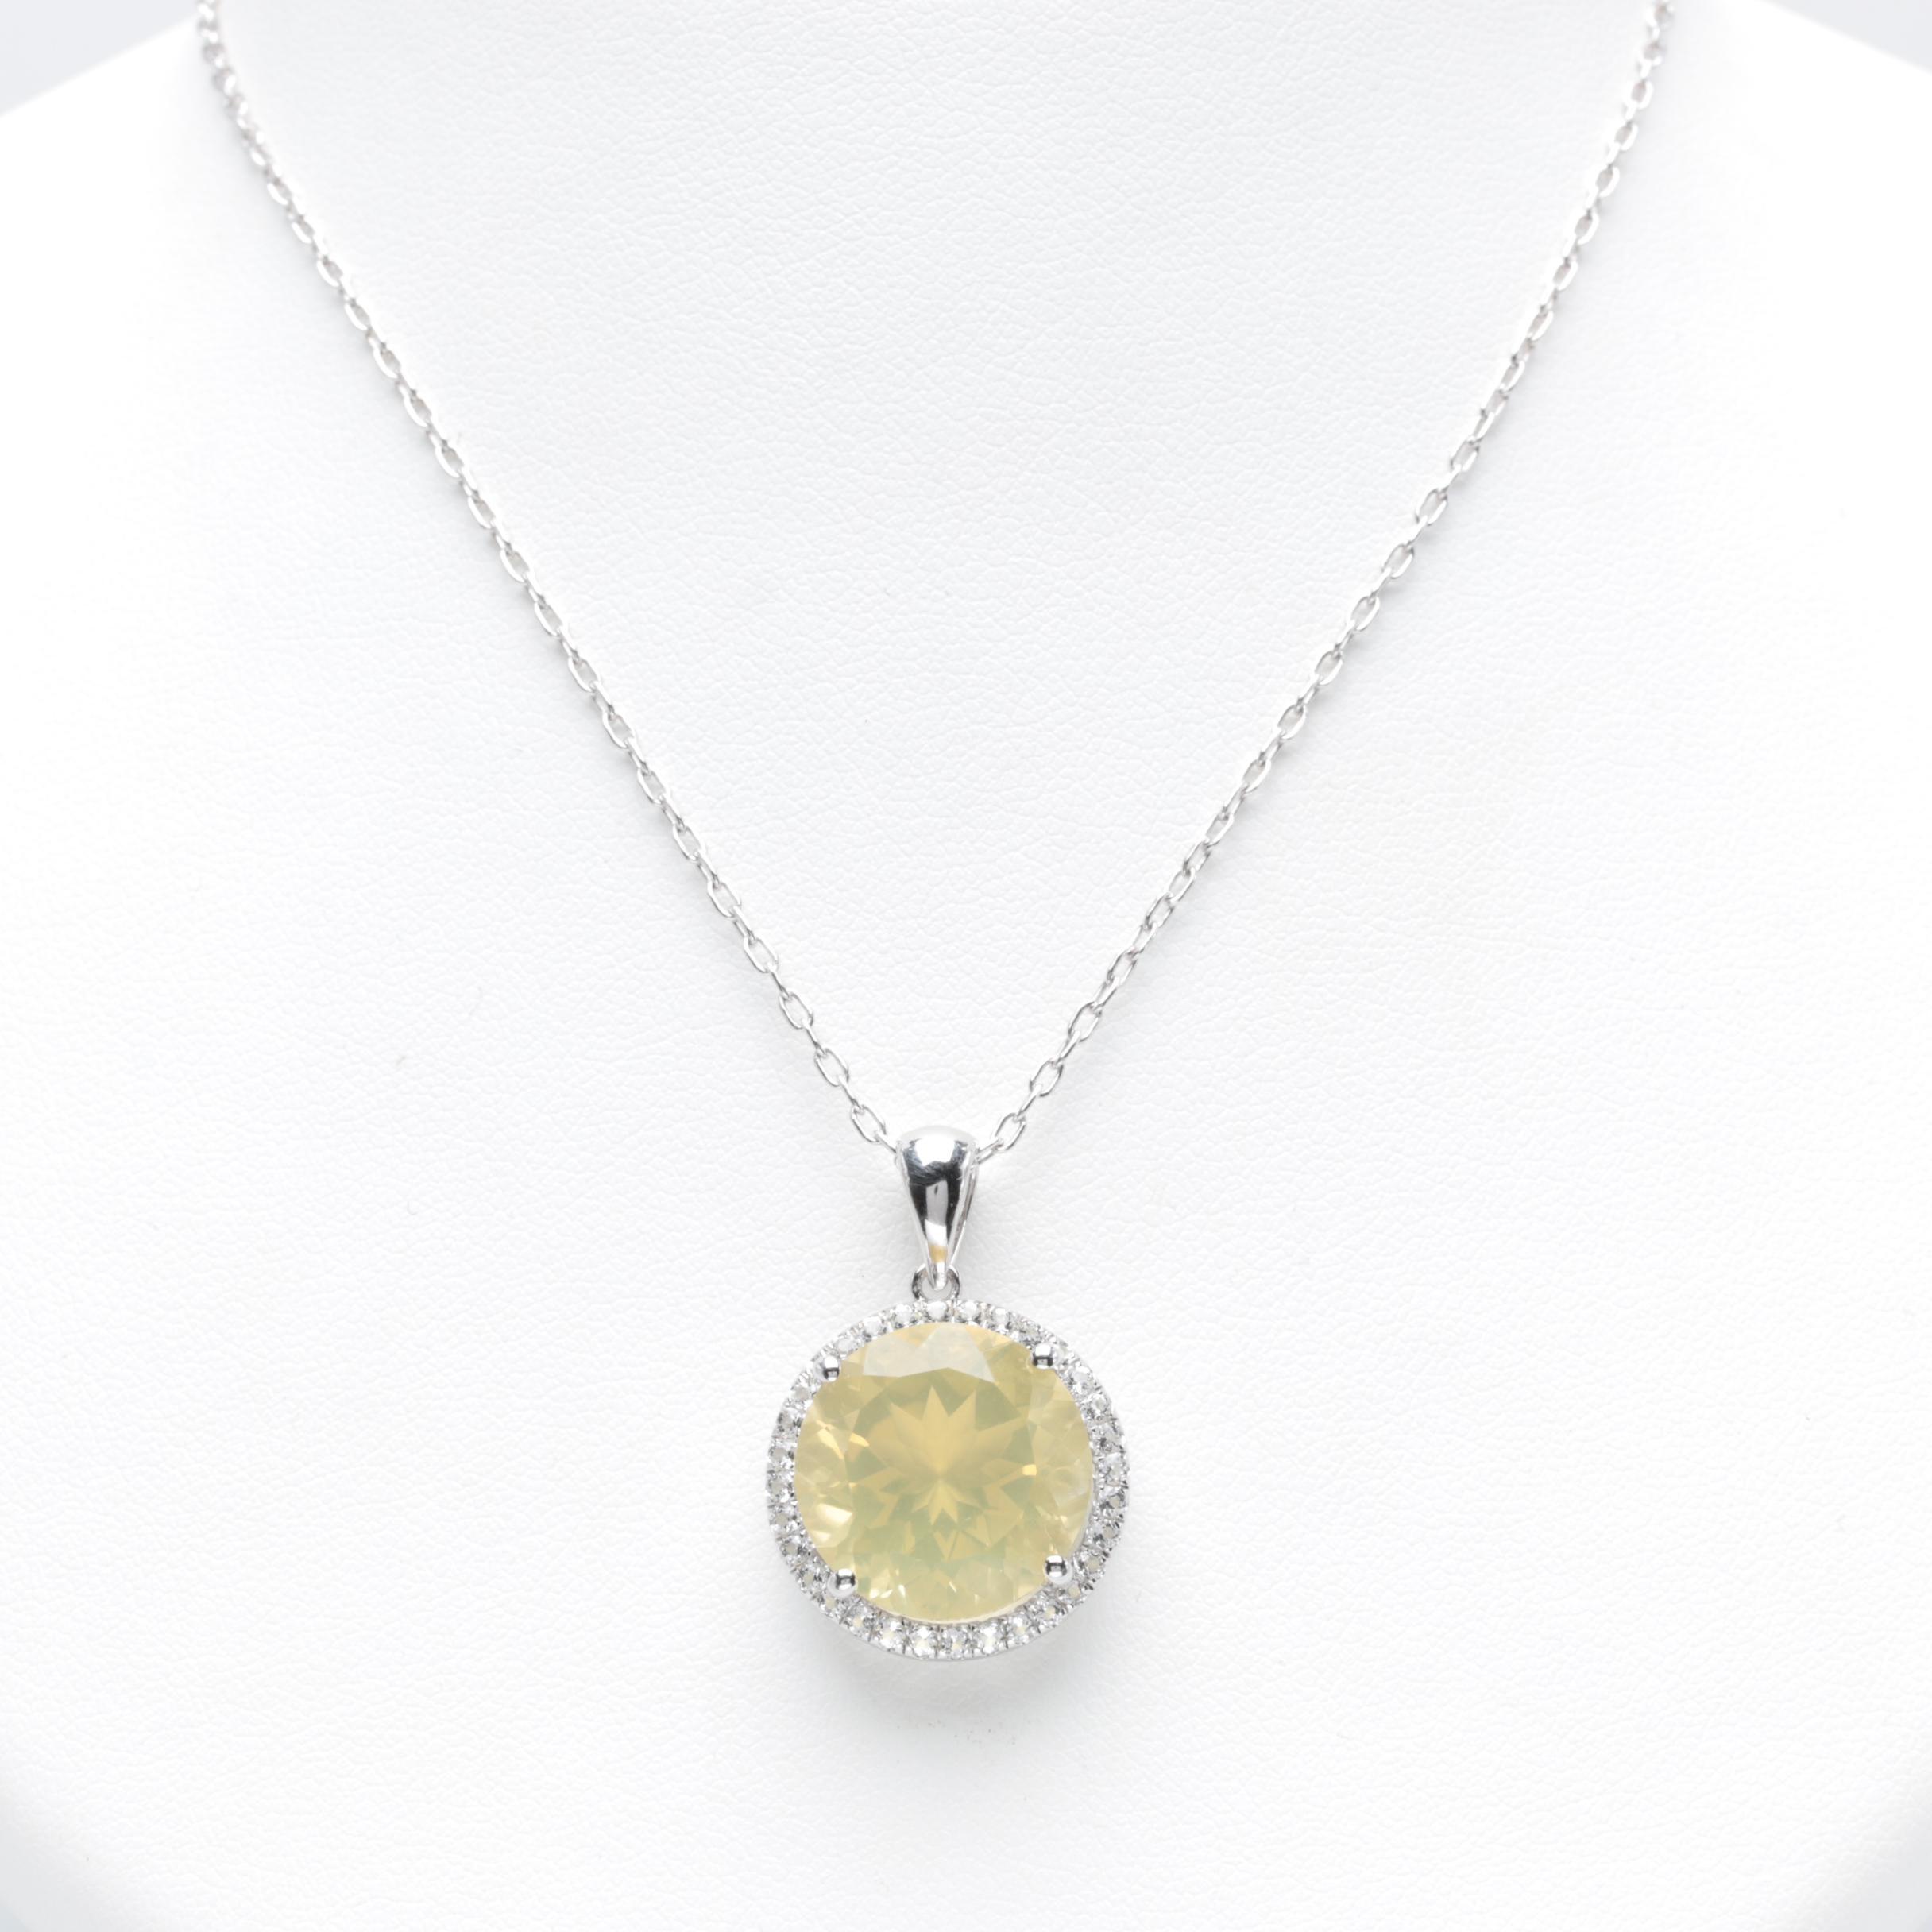 Sterling Silver Lemon Quartz and White Topaz Pendant Necklace